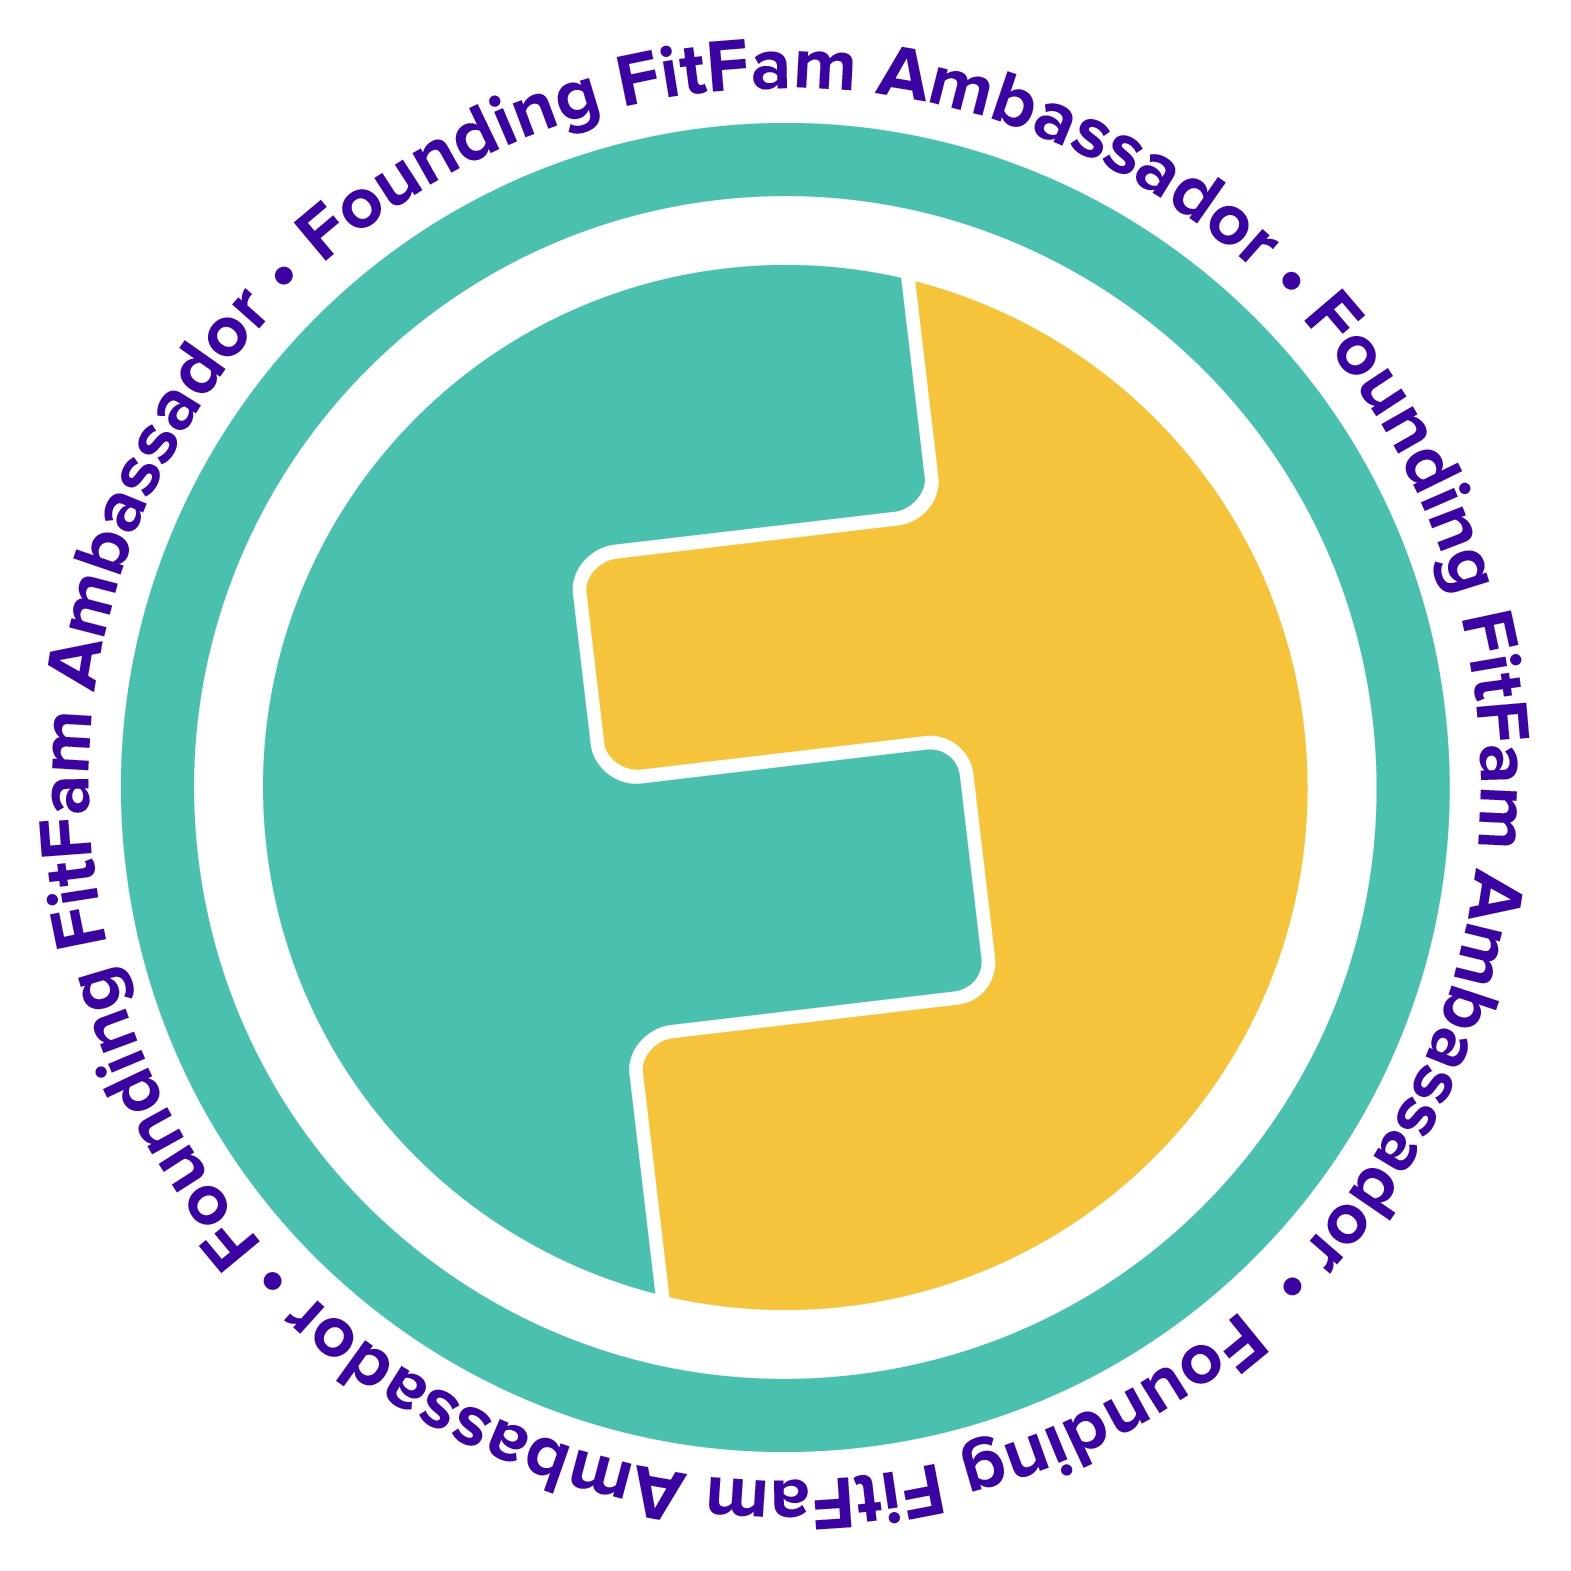 Founding FitFam Ambassador